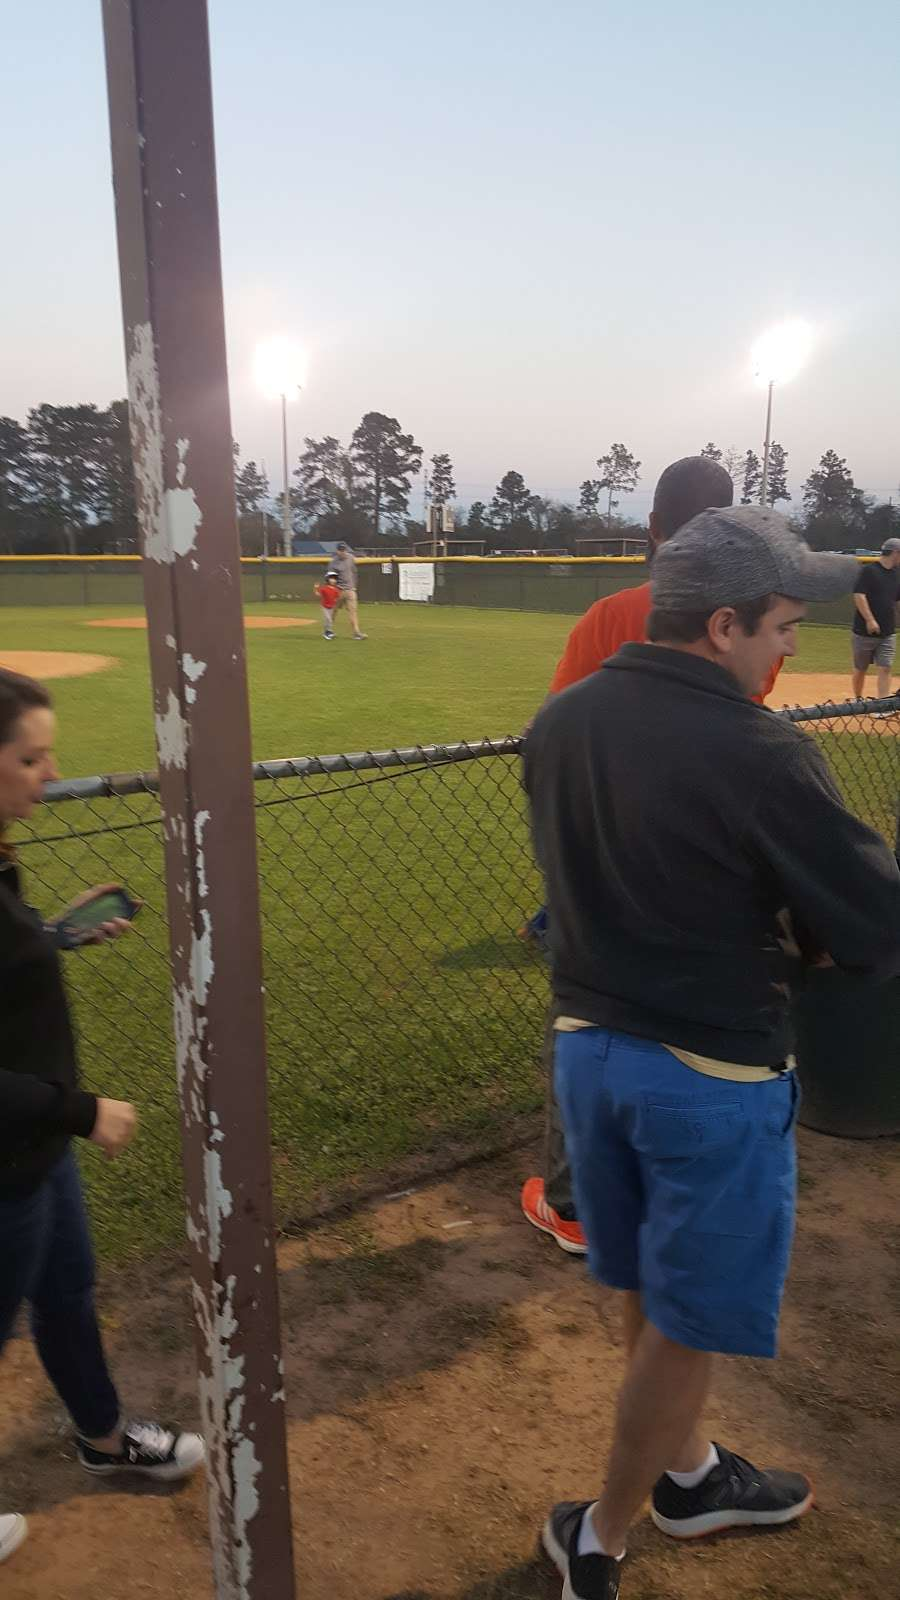 Rothwood Park Baseball - park    Photo 10 of 10   Address: 22430 Rothwood Rd, Spring, TX 77389, USA